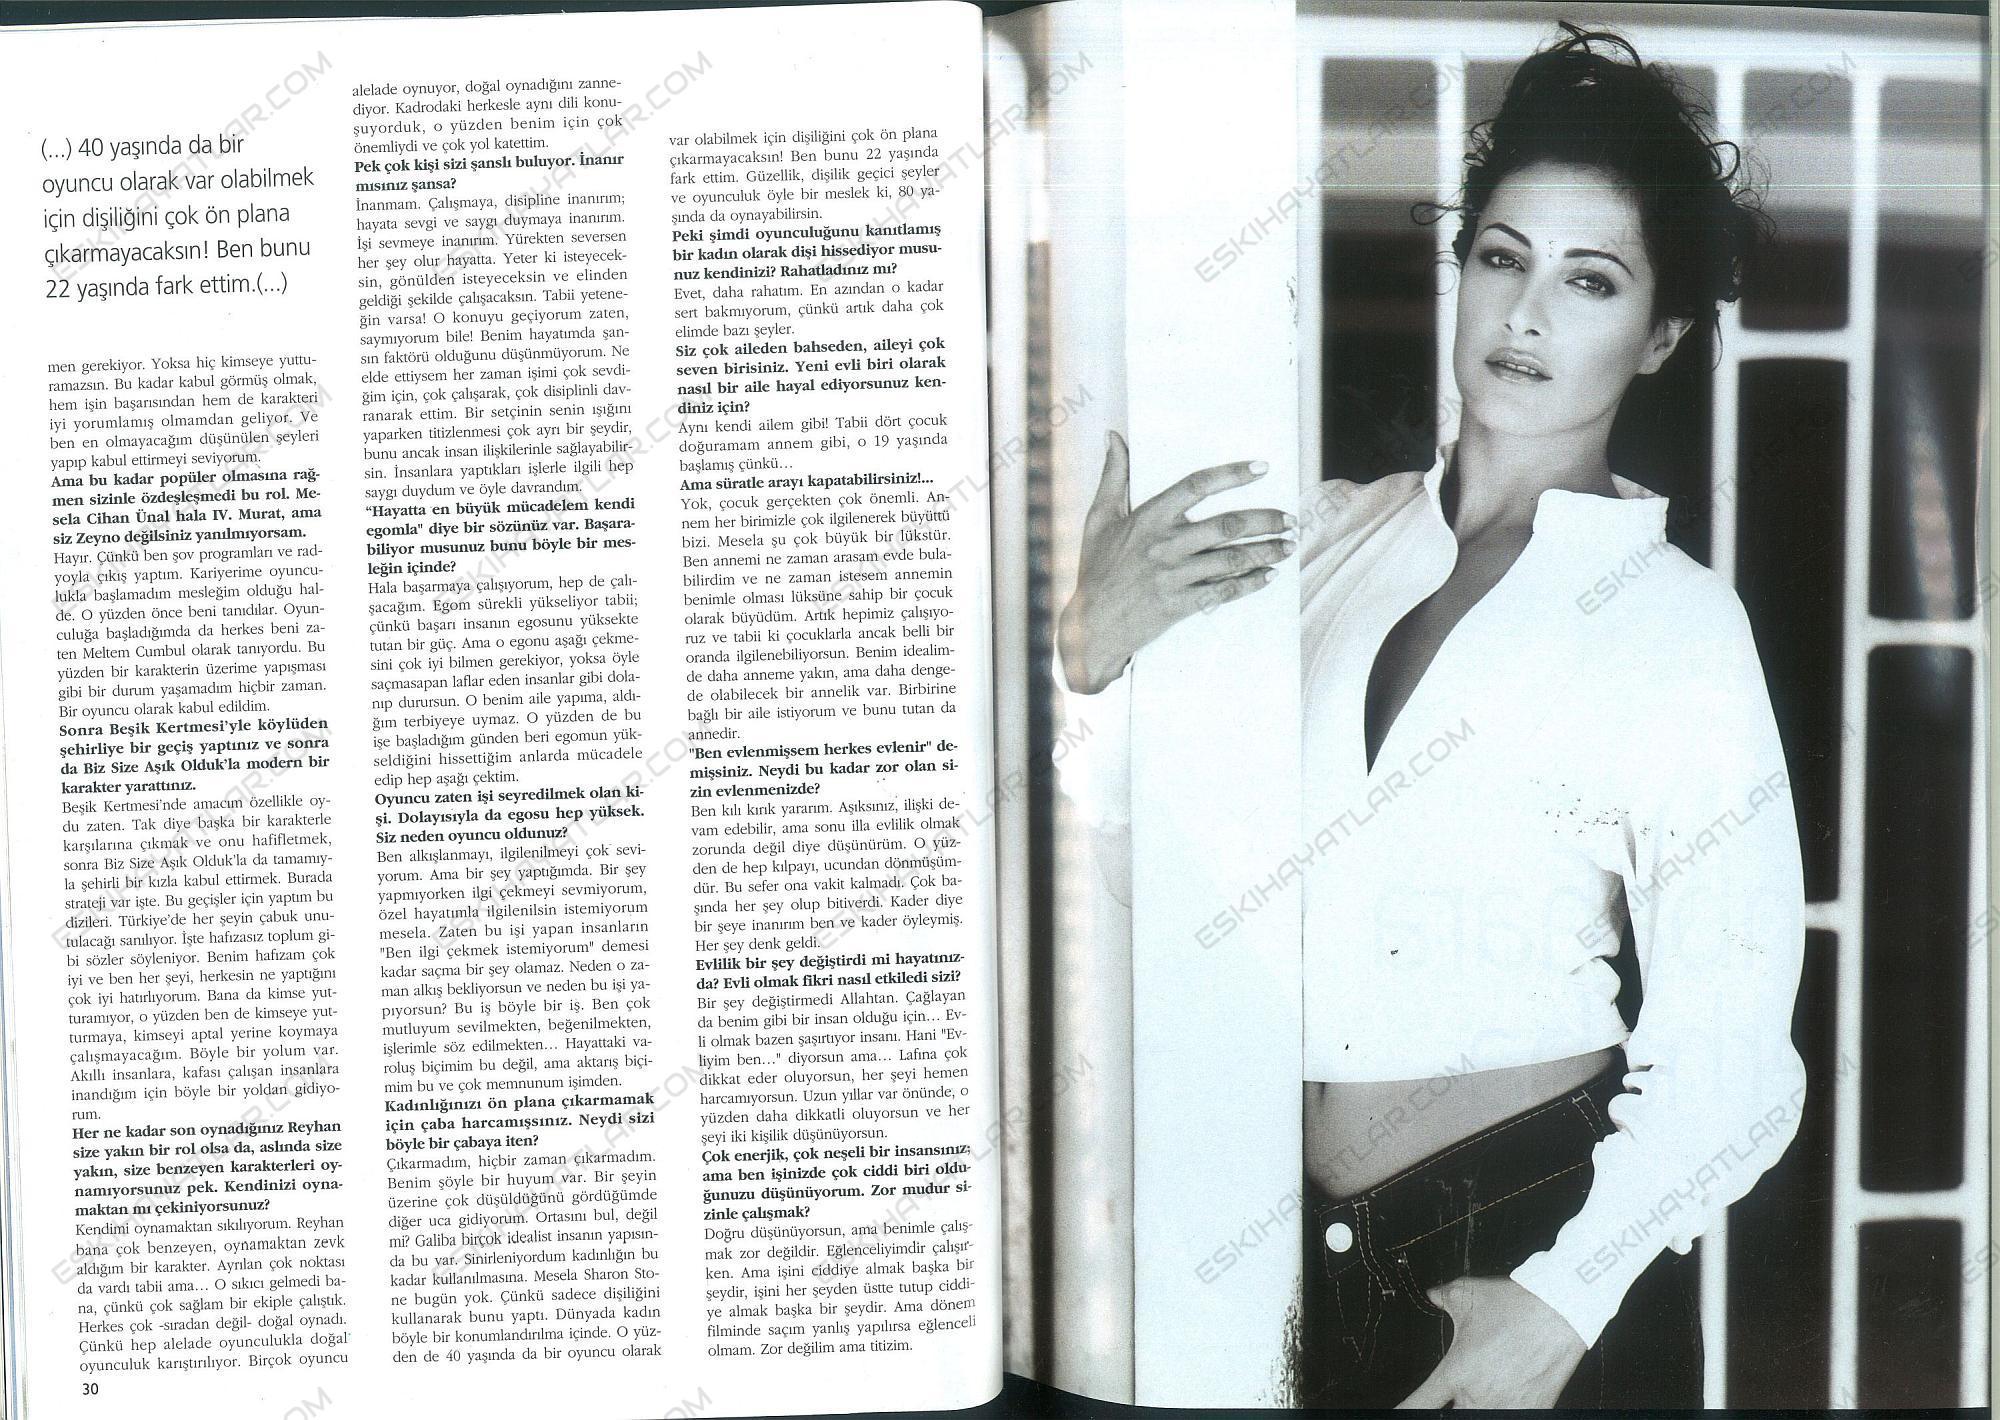 meltem-cumbul-roportaji-abdulhamit-duserken-karisik-pizza-filmi-2003-vizyon-dergisi (6) (1)